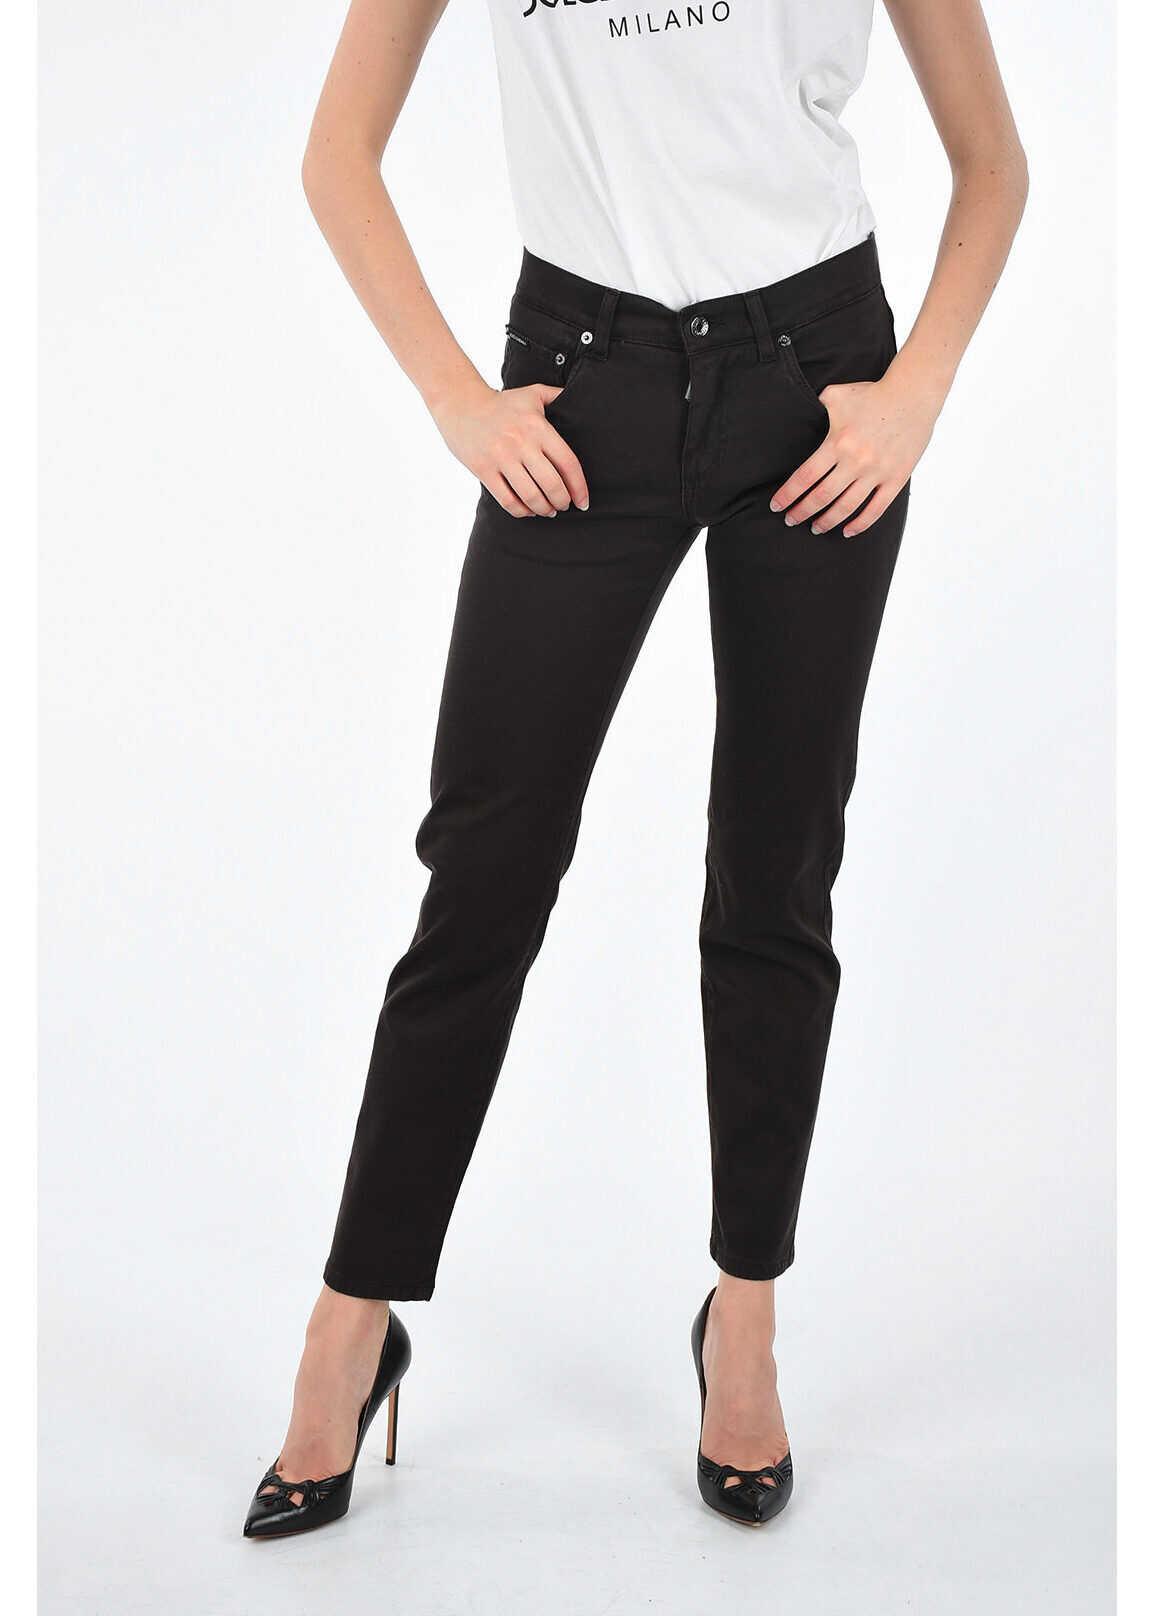 Dolce & Gabbana 15,5cm Denim Stretch GOLD Jeans BROWN